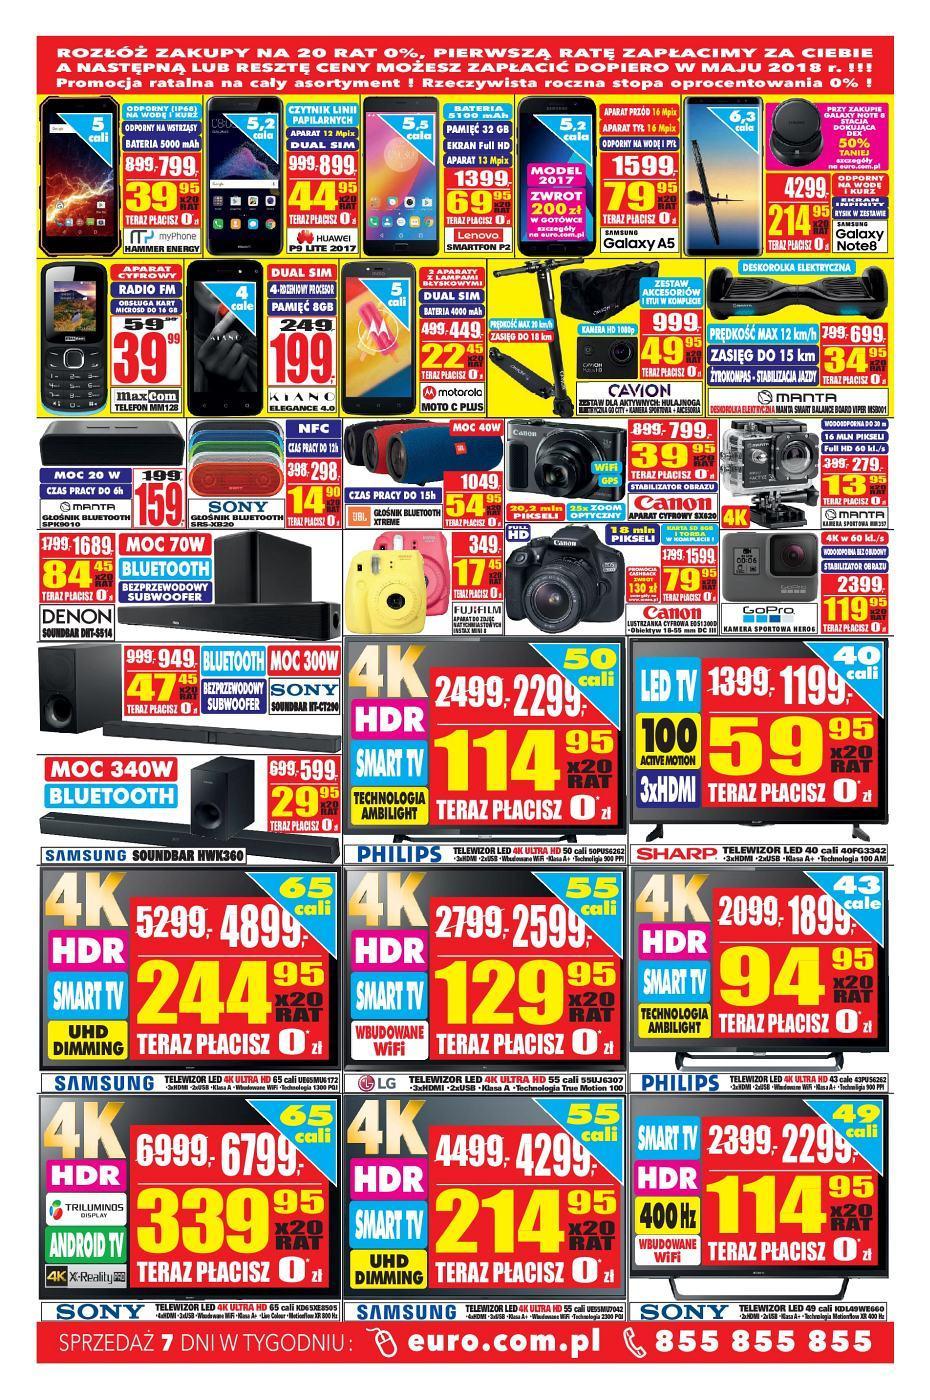 Gazetka promocyjna RTV Euro AGD do 31/12/2017 str.2